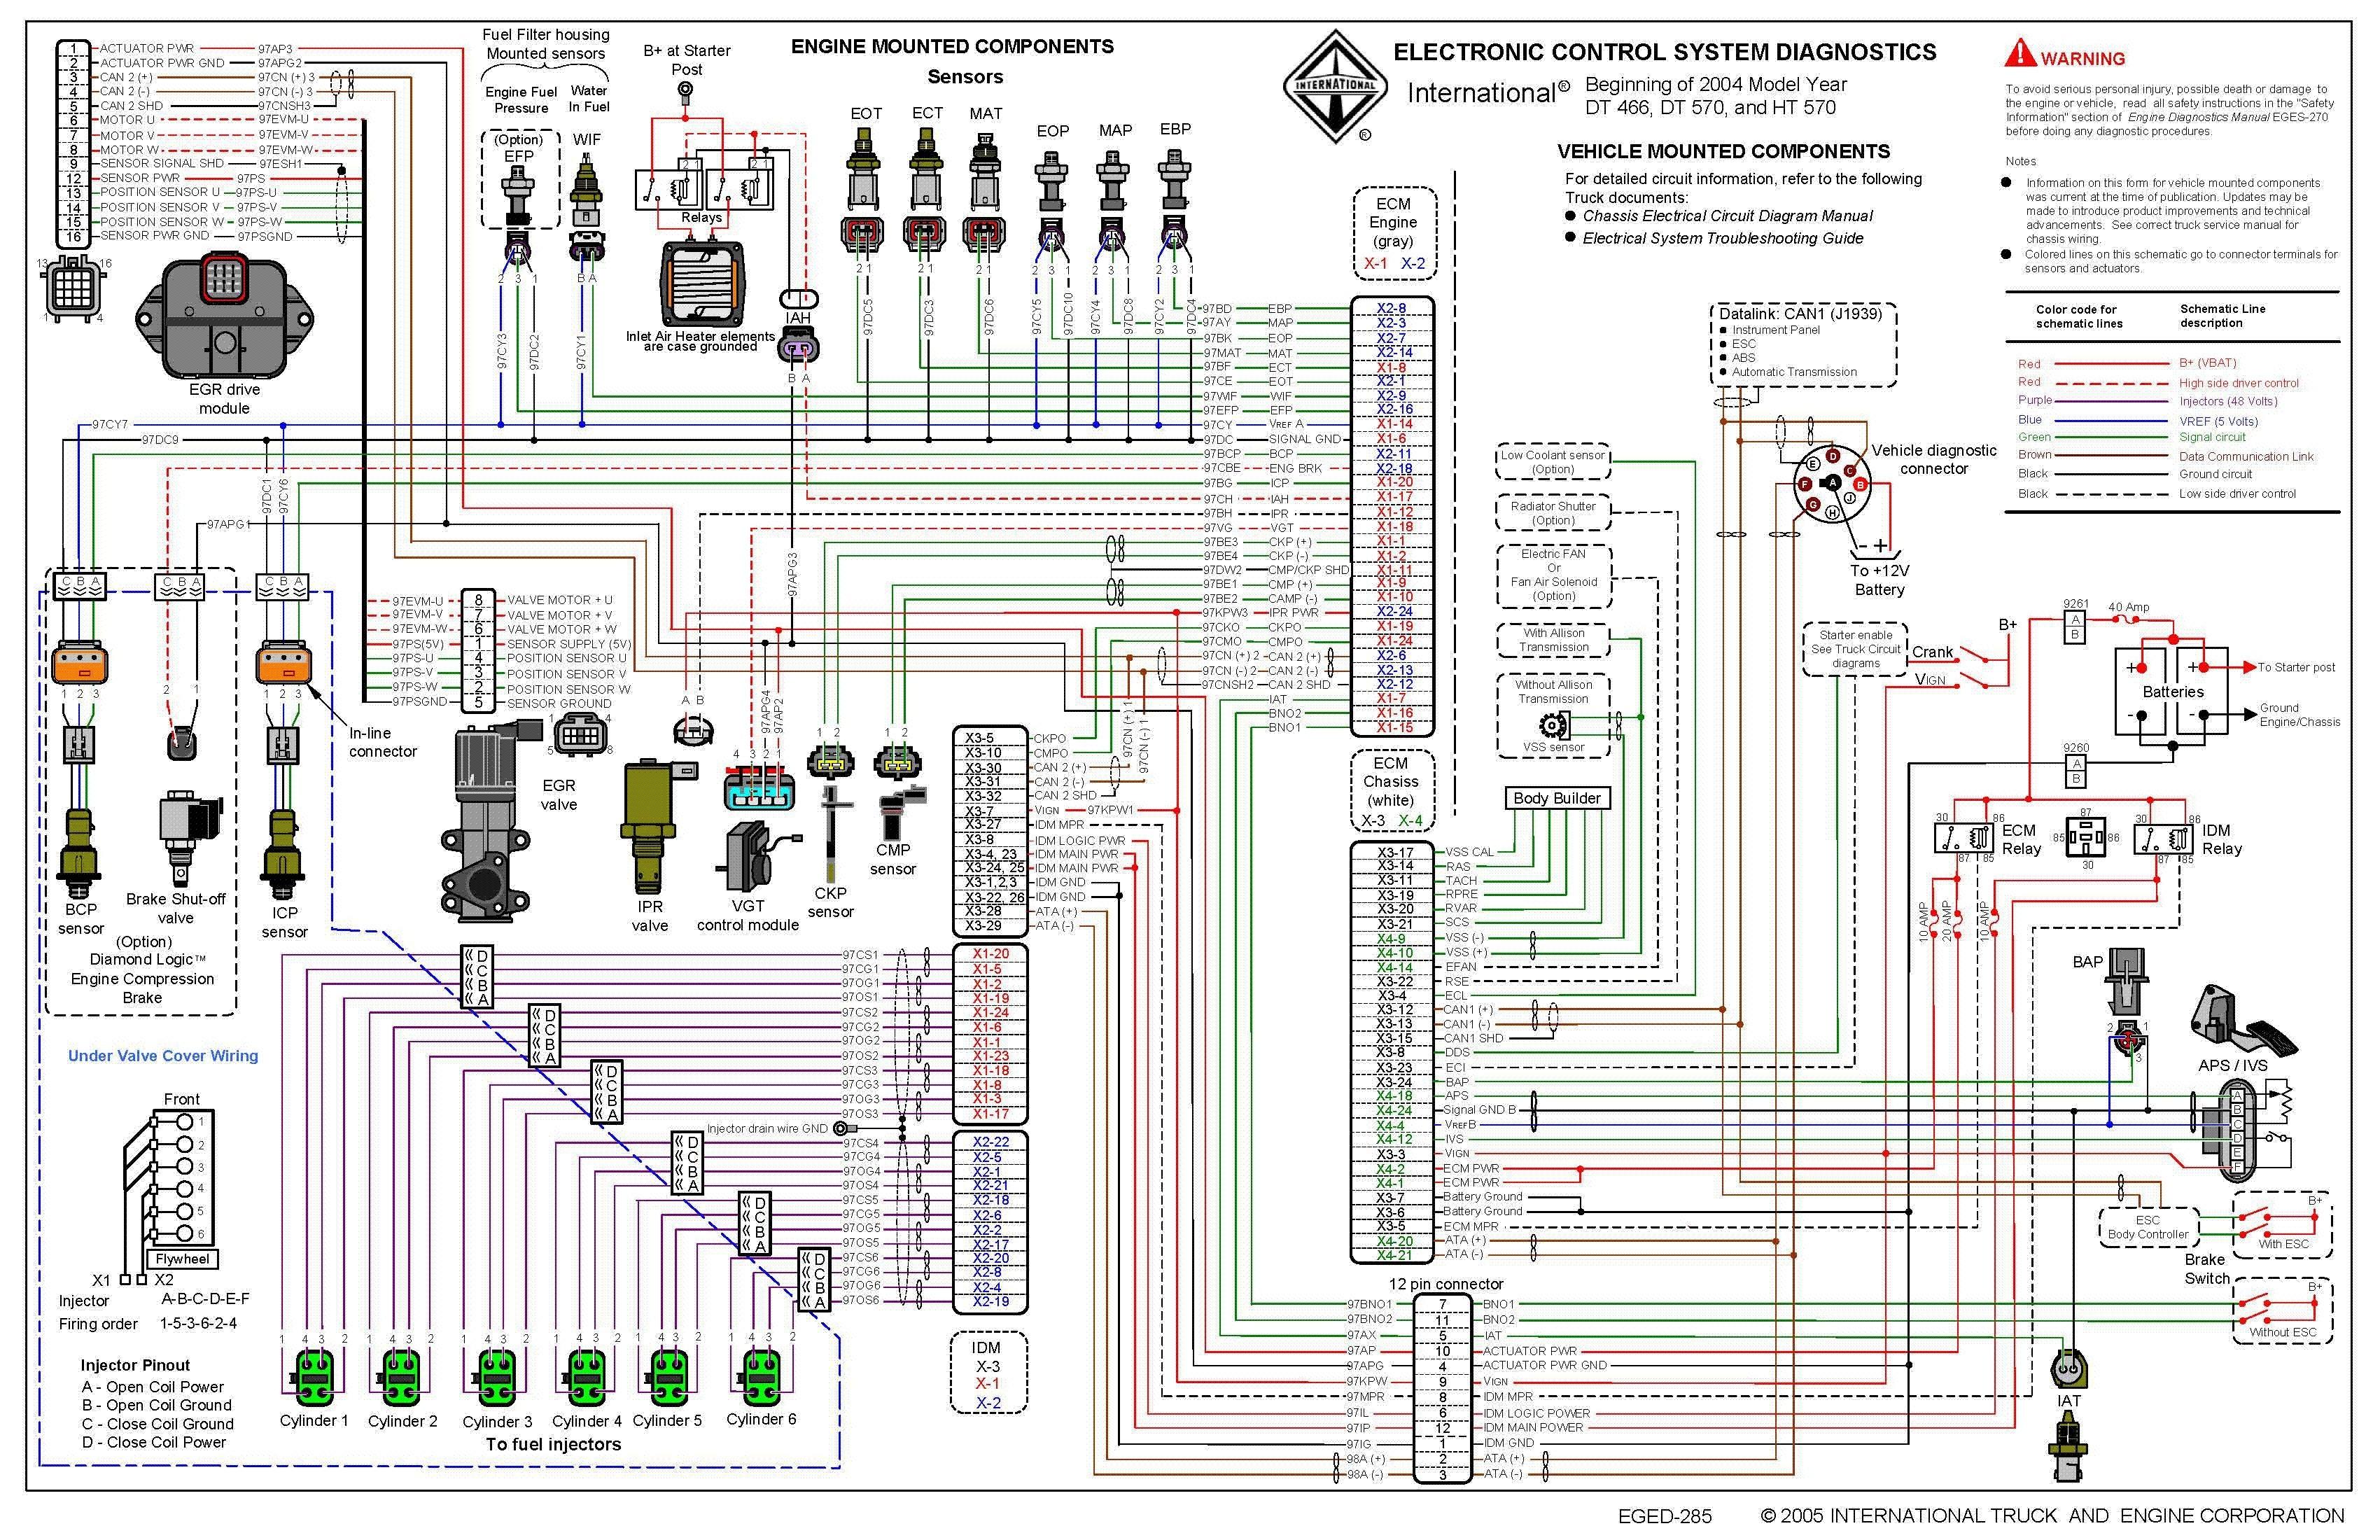 International Truck Wiring Diagram International Truck Wiring Diagram Diagrams Data 2i at 2004 4300 Of International Truck Wiring Diagram